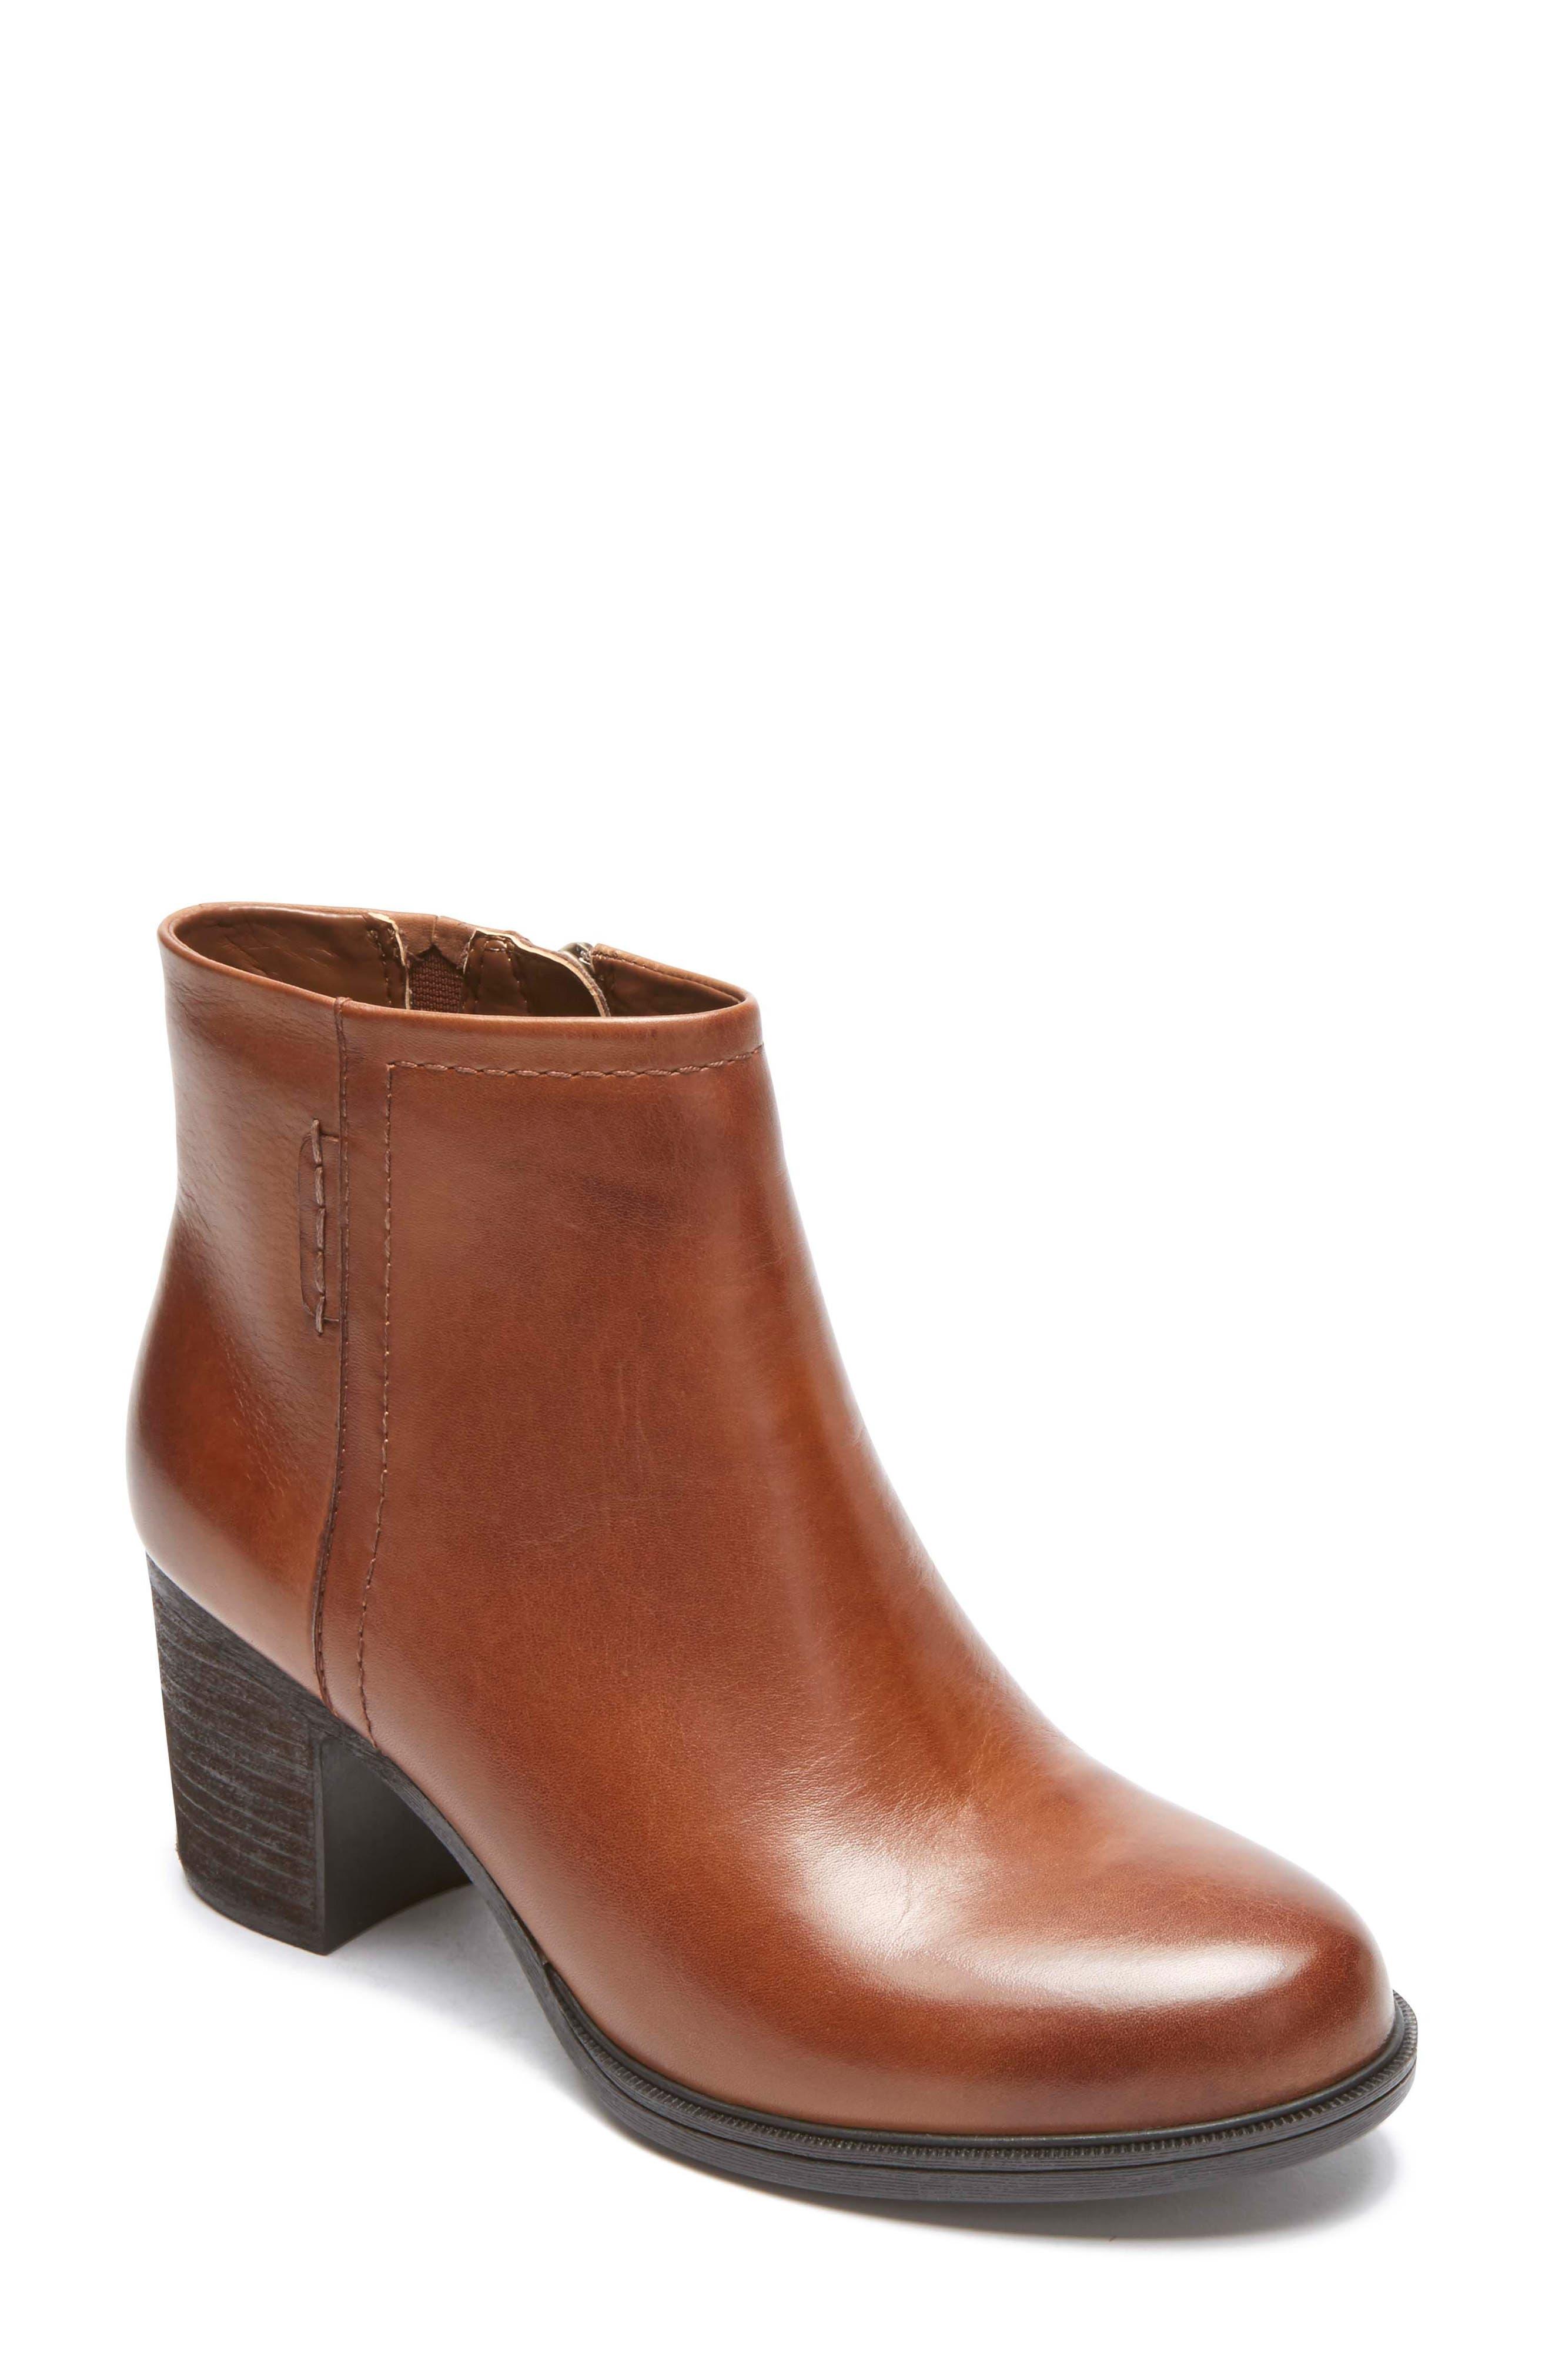 Natashya Bootie,                         Main,                         color, Almond Leather